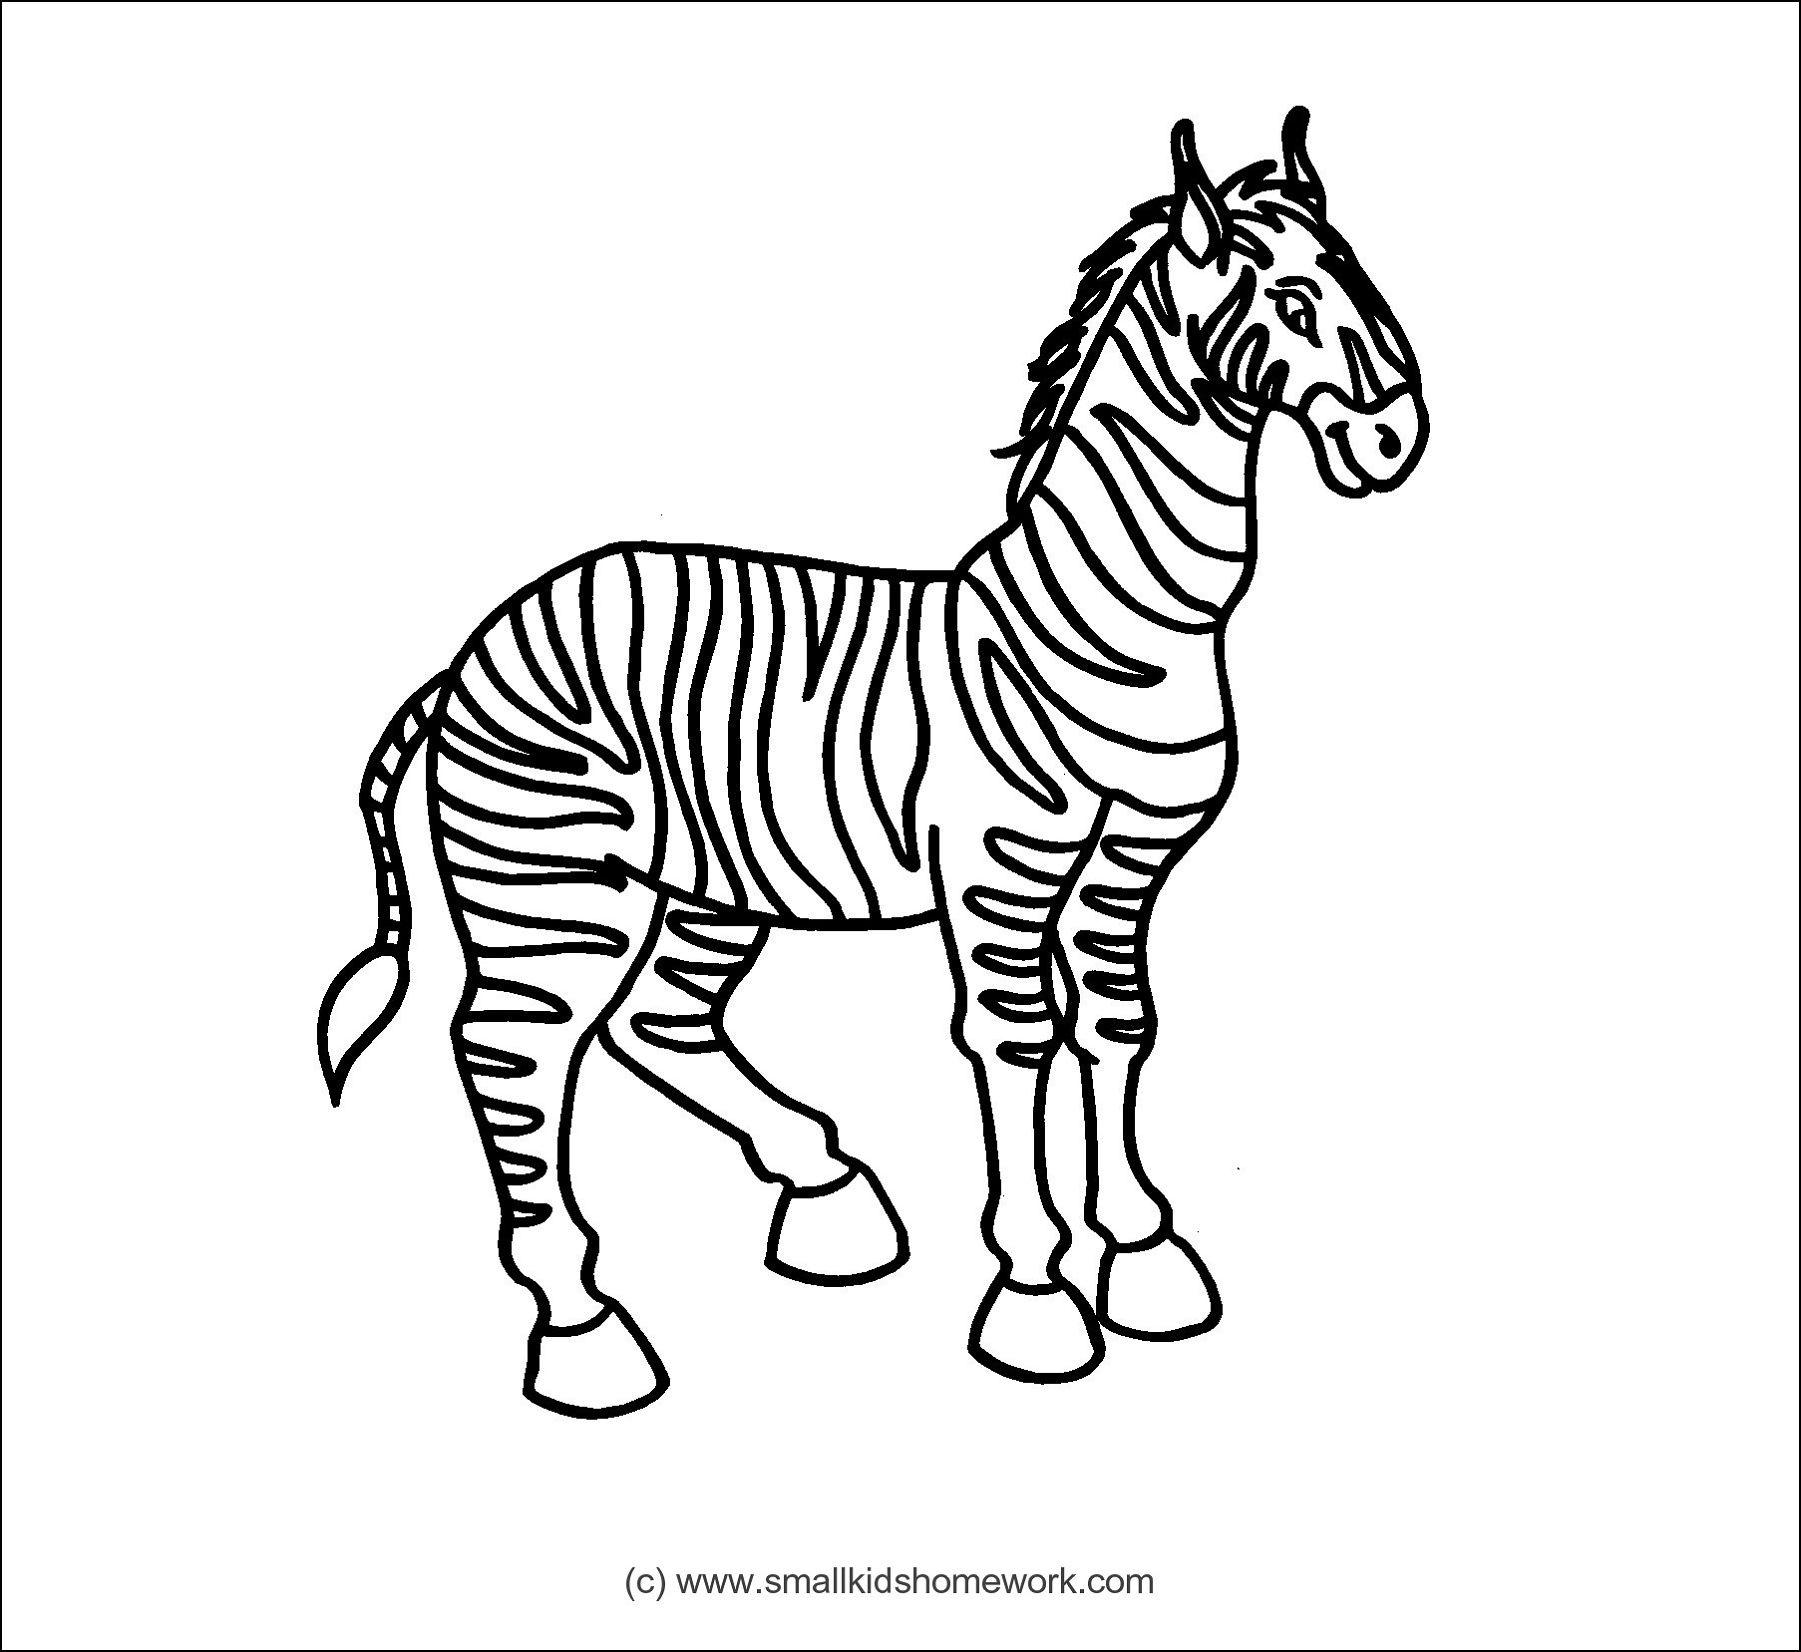 zebra outline picture outline pictures pinterest outline